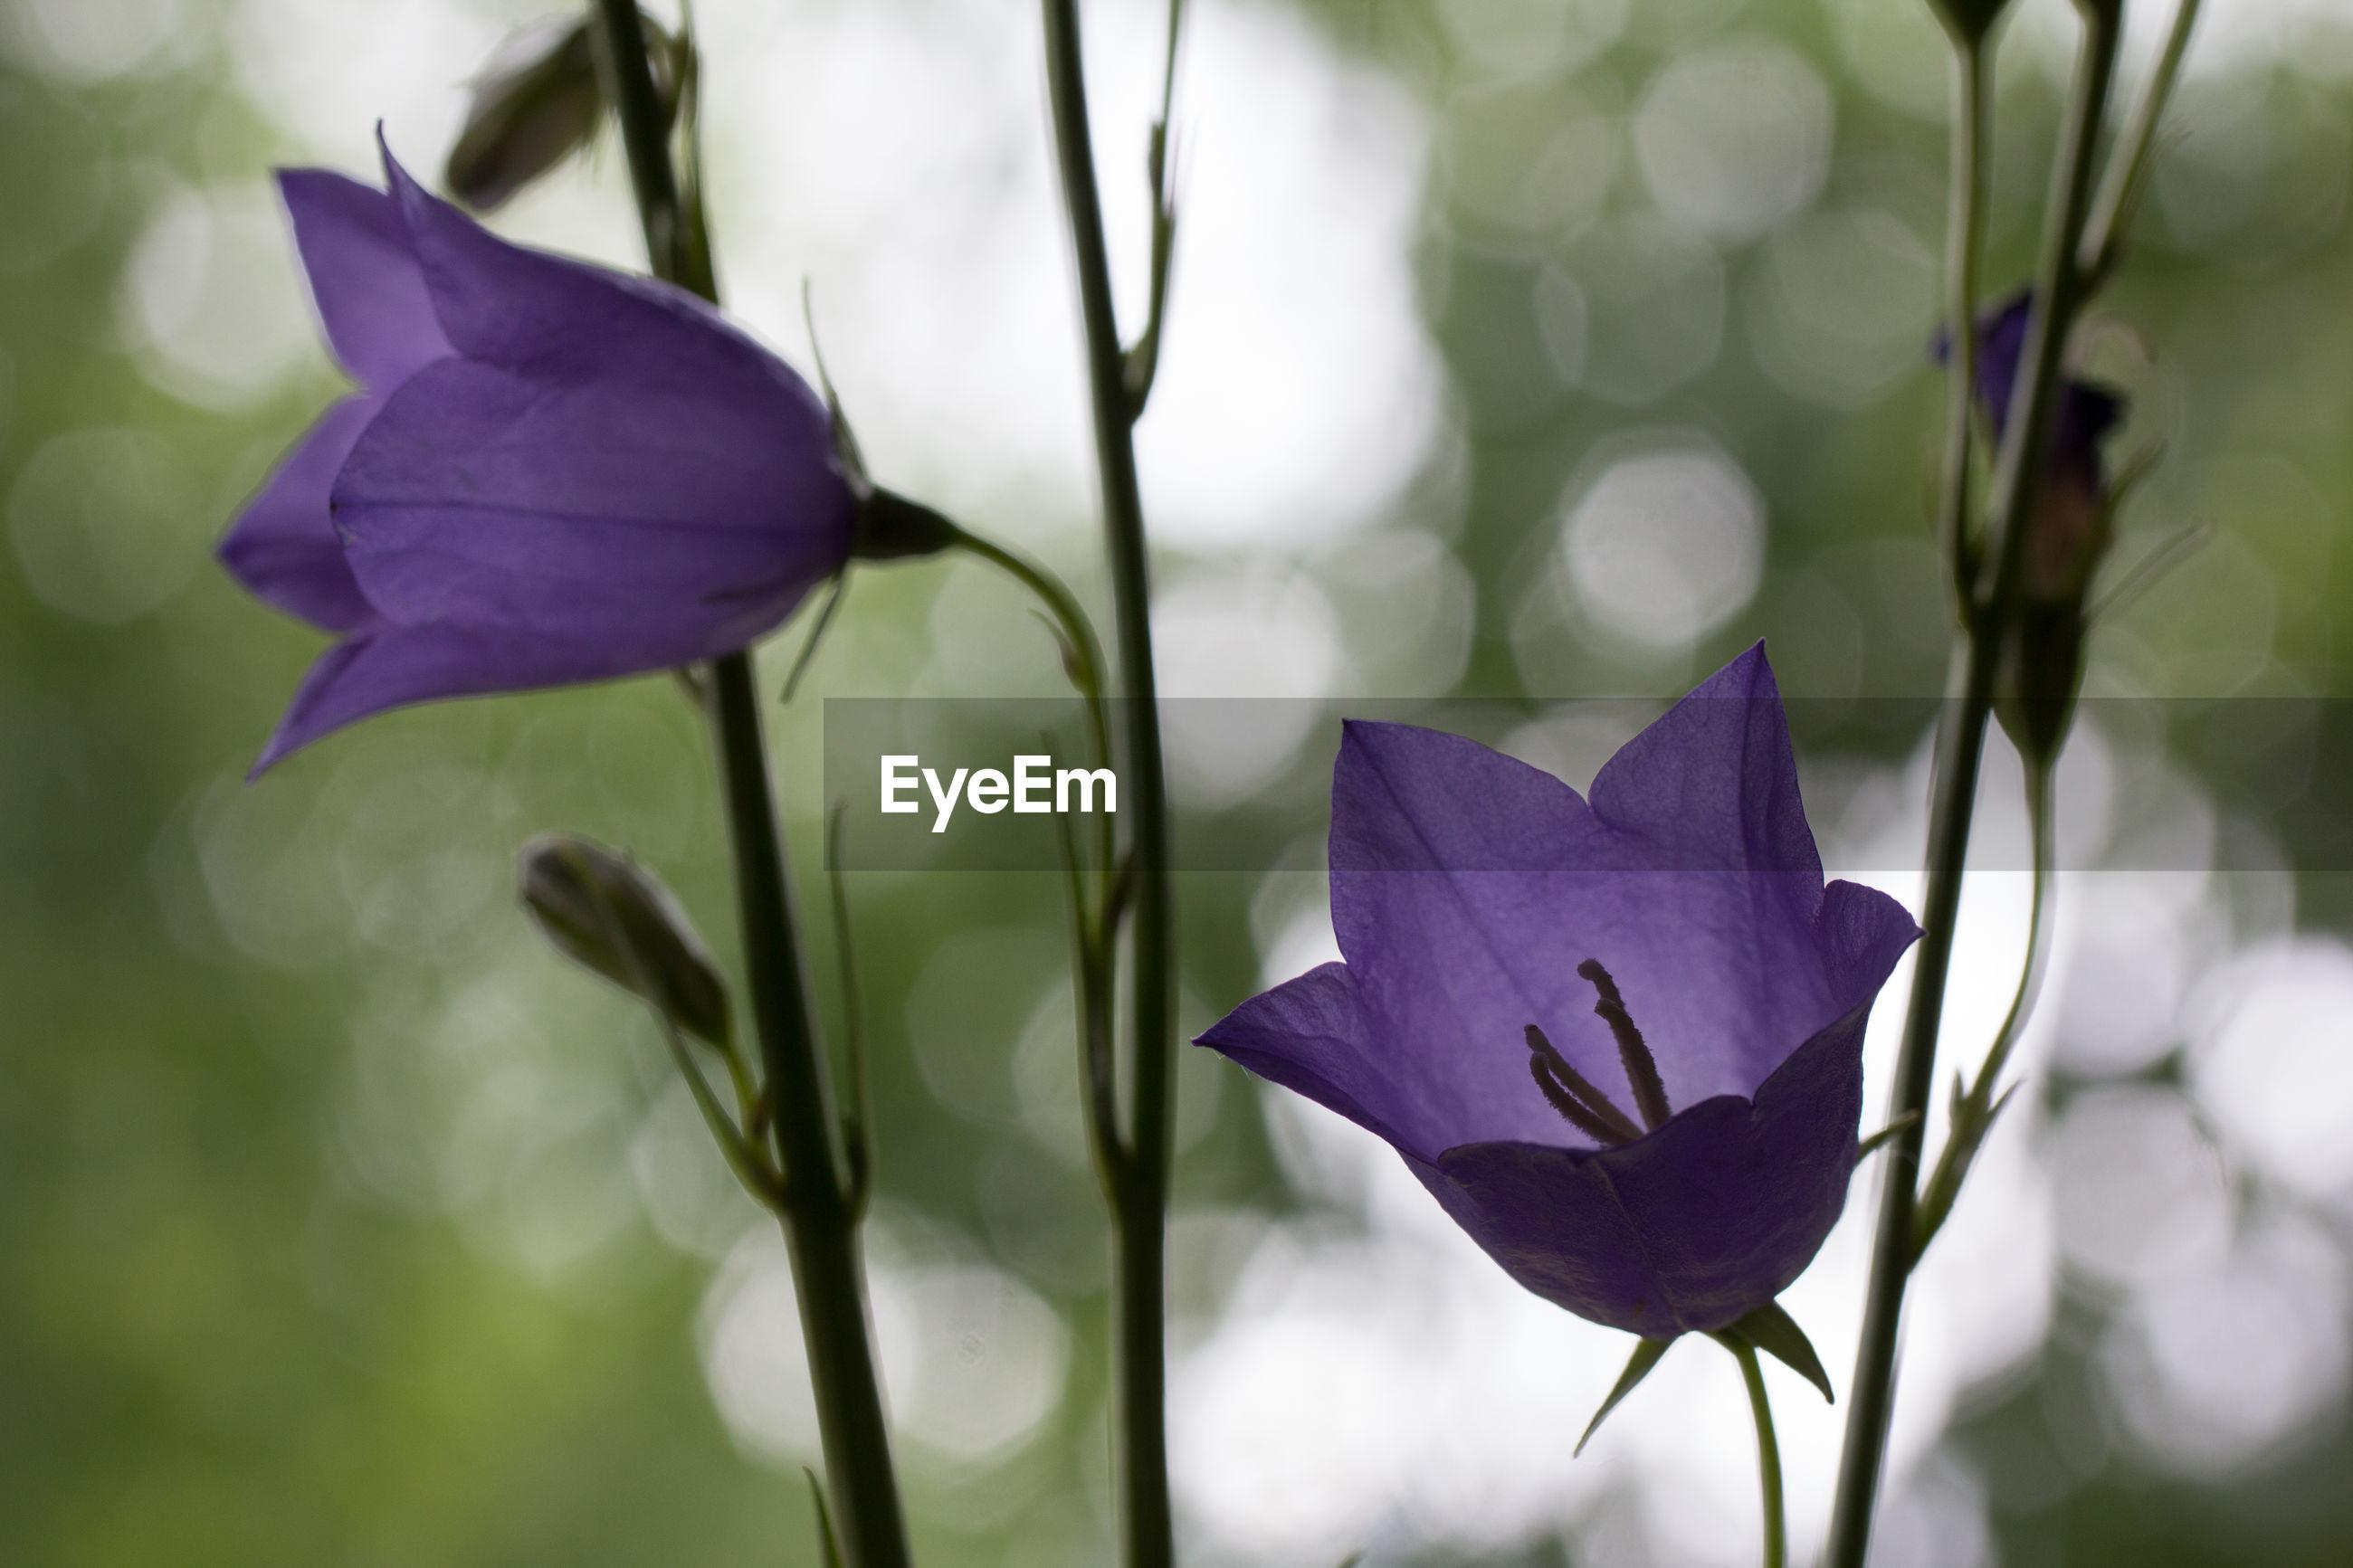 CLOSE-UP OF PURPLE IRIS FLOWER GROWING OUTDOORS